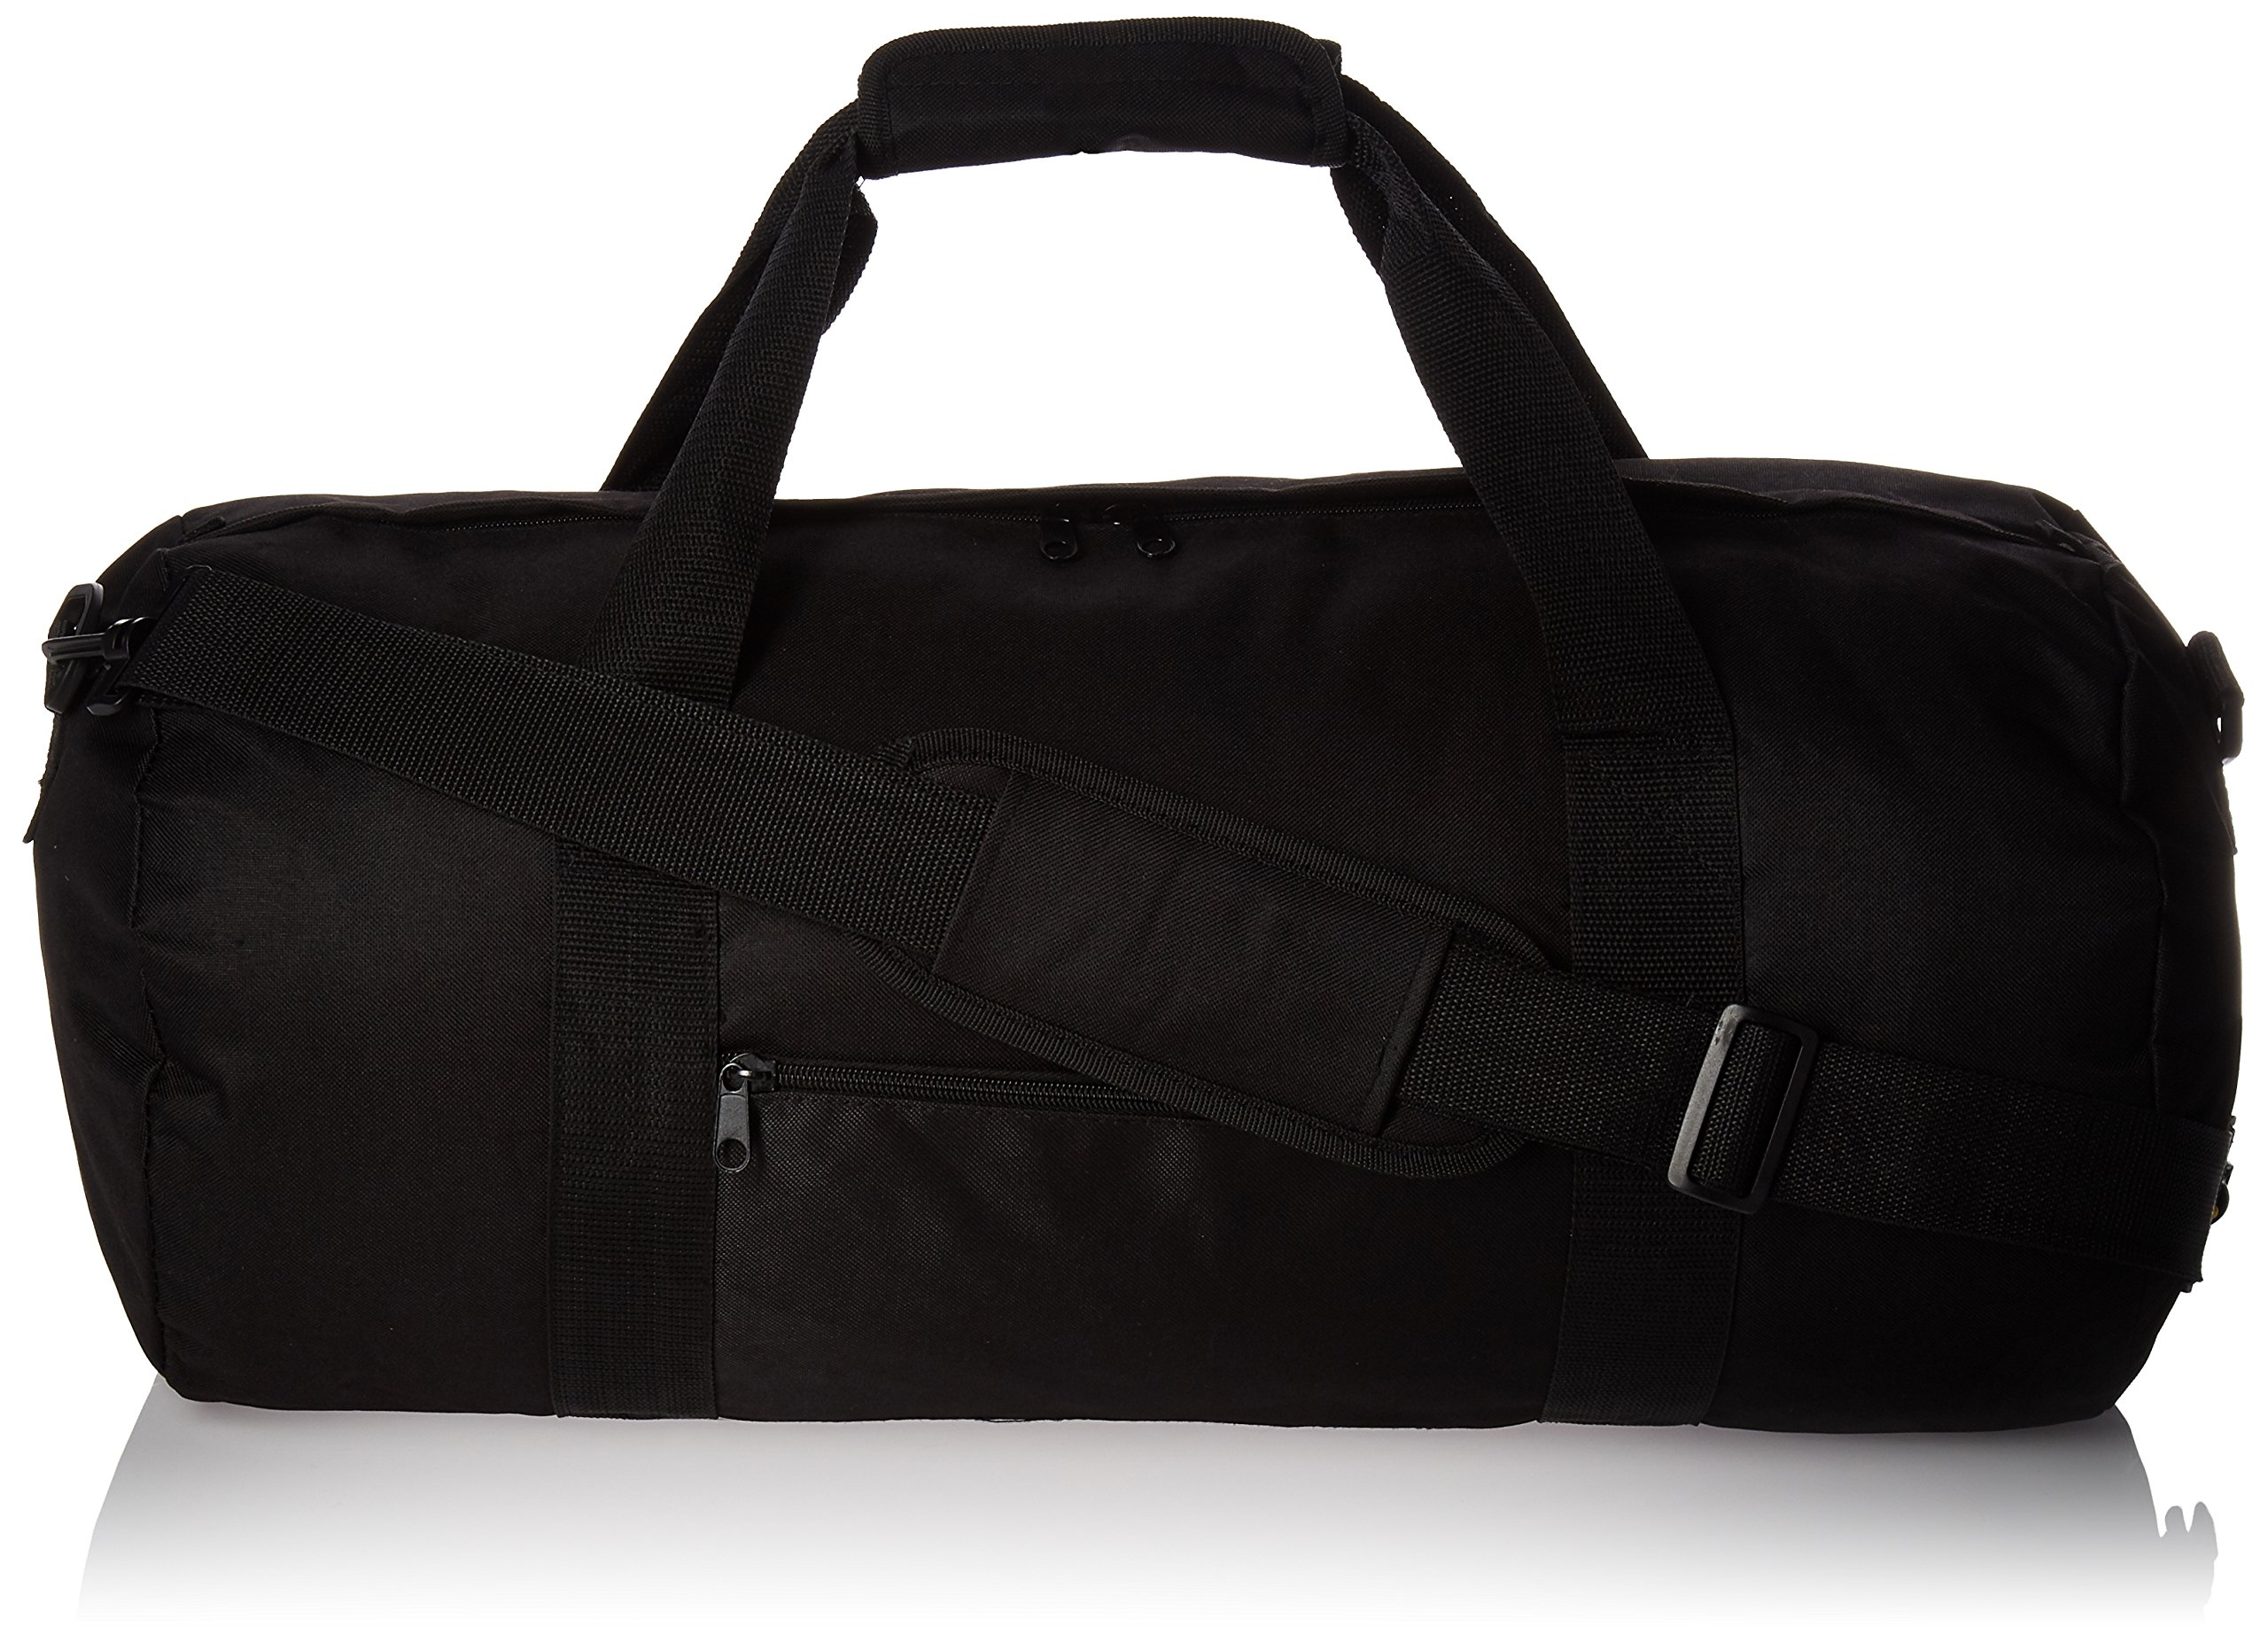 World Famous Sports Duffel Bag, Black, Jumbo